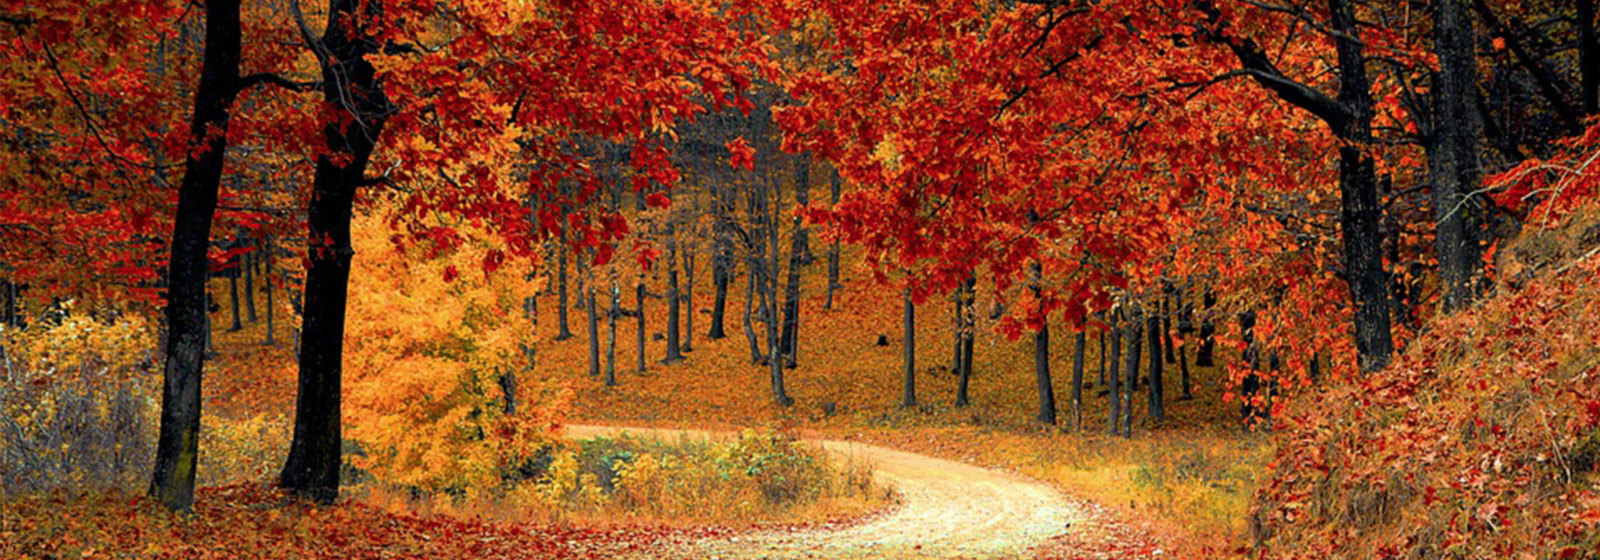 Fall trees lining road image slide